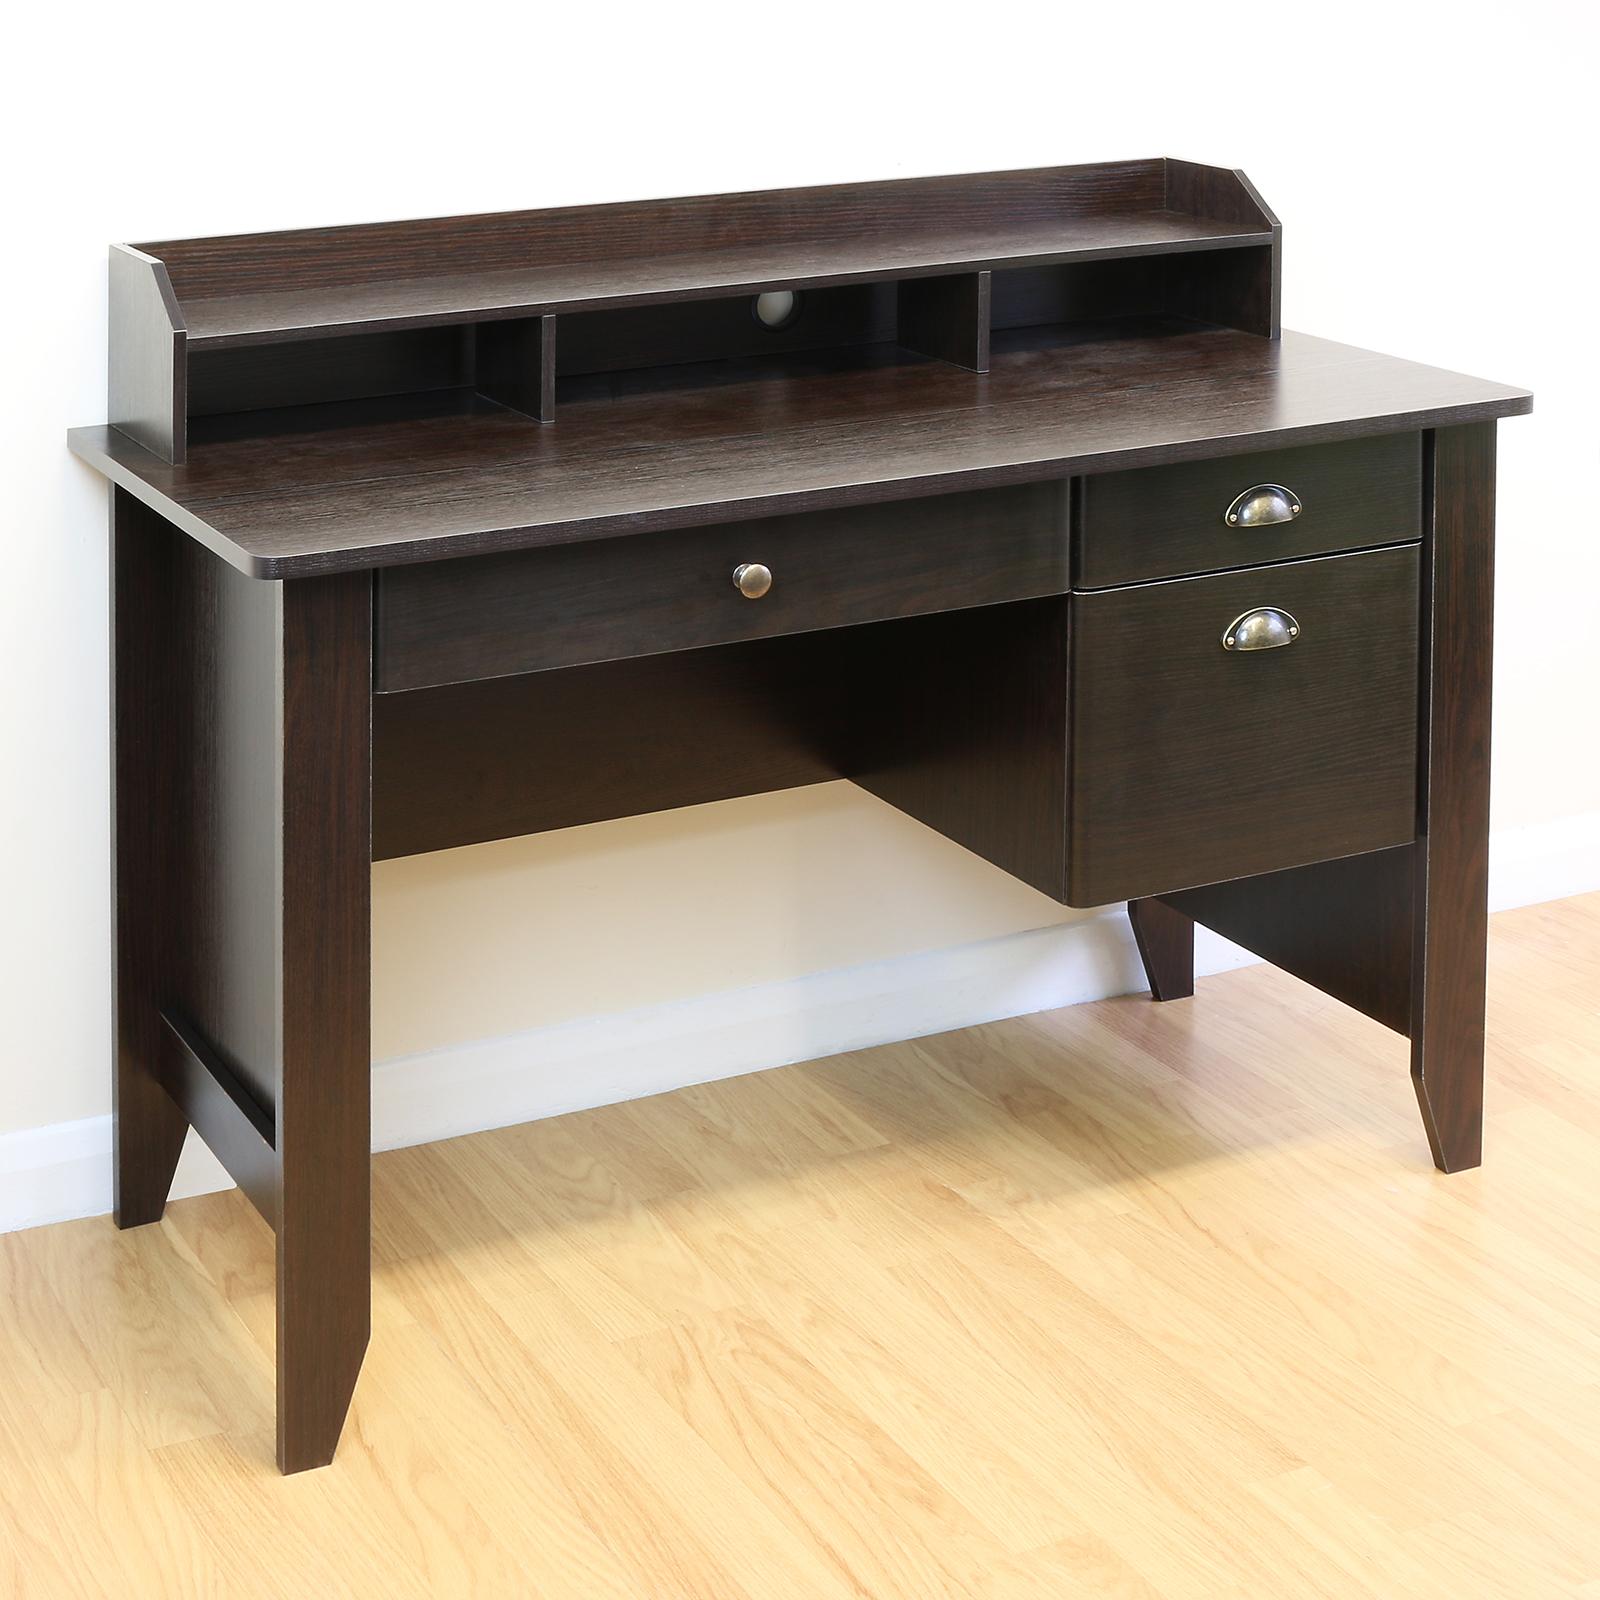 Sentinel Home Office Study Dark Wood Computer Pc Work Desk Monitor Shelf Storage Drawers